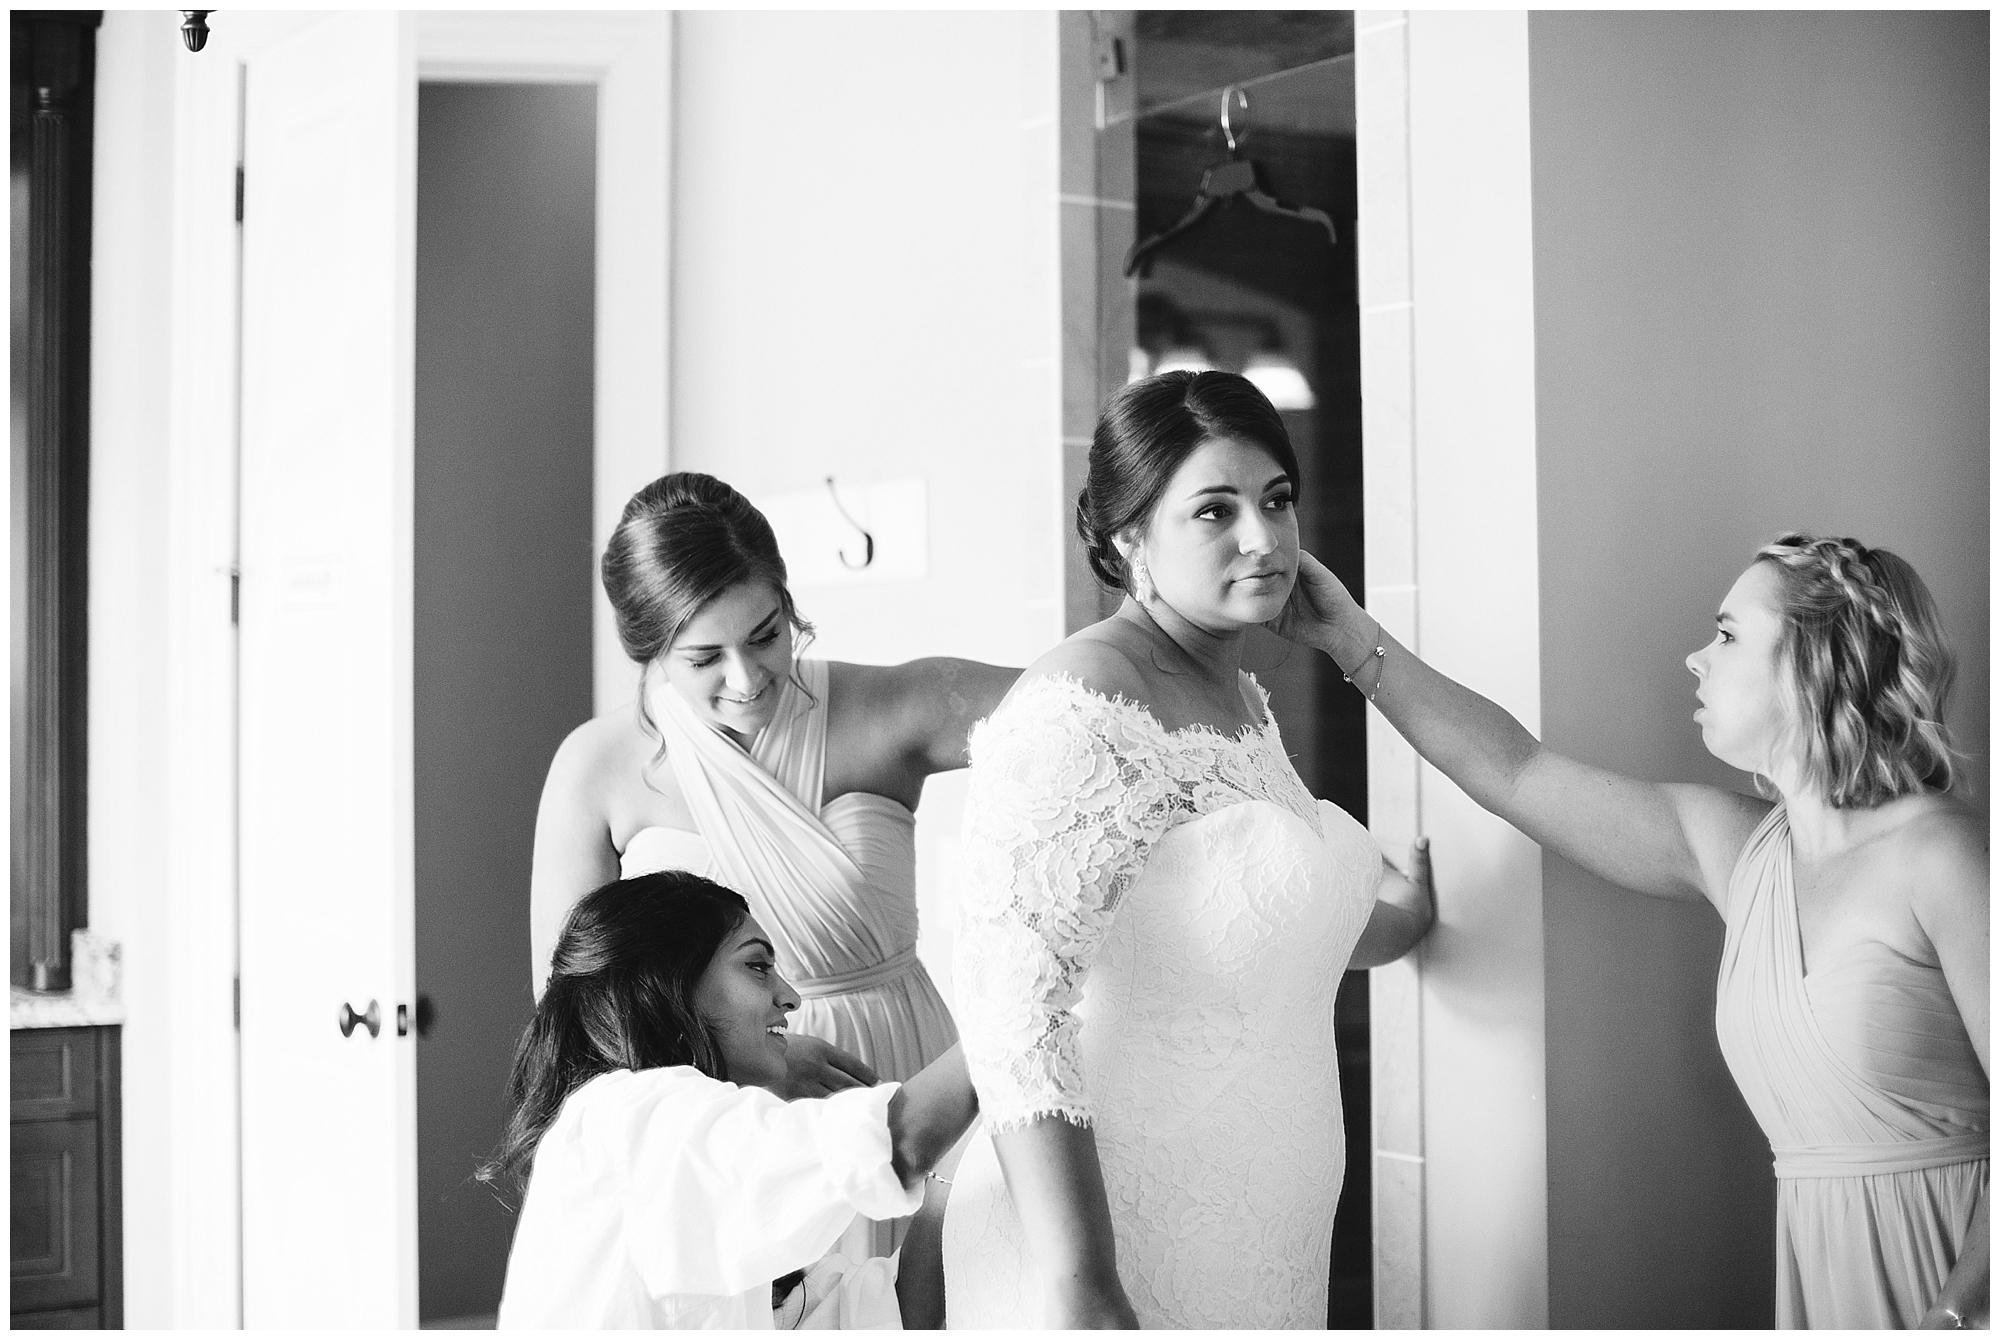 Oaks-at-salem-wedding-apex-photography-30.jpg